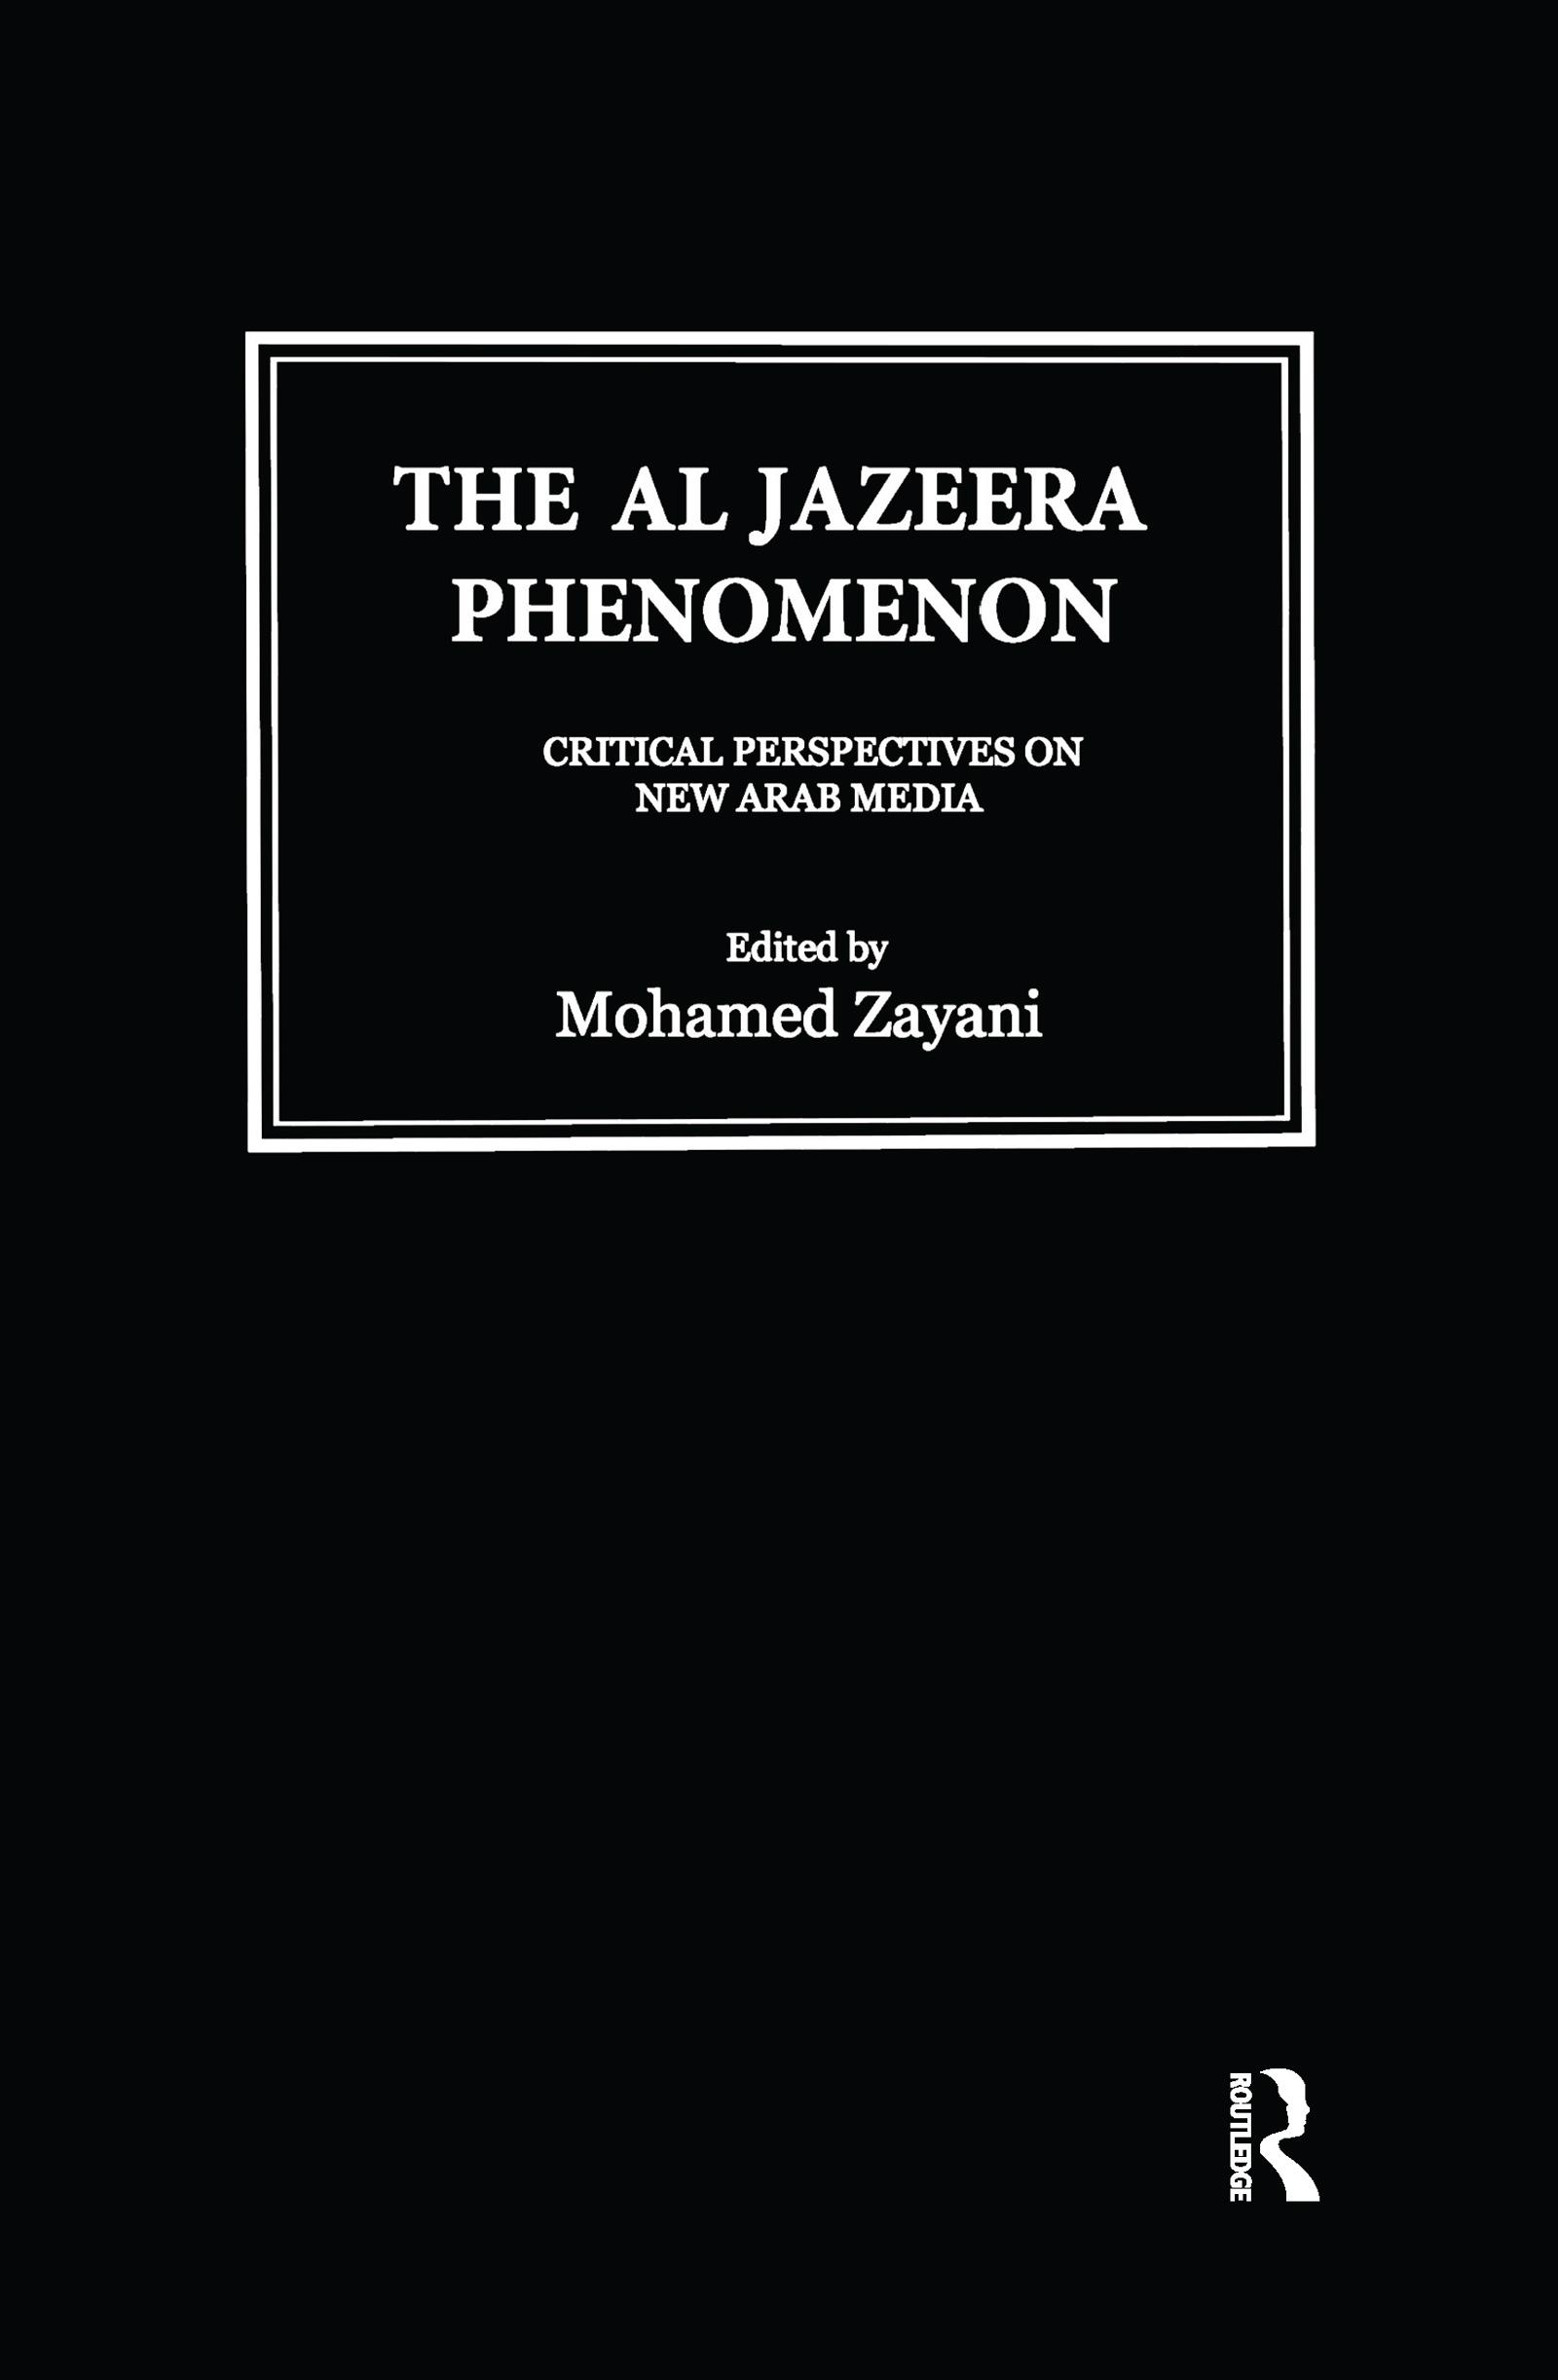 Al Jazeera Phenomenon: Critical Perspectives on New Arab Media book cover